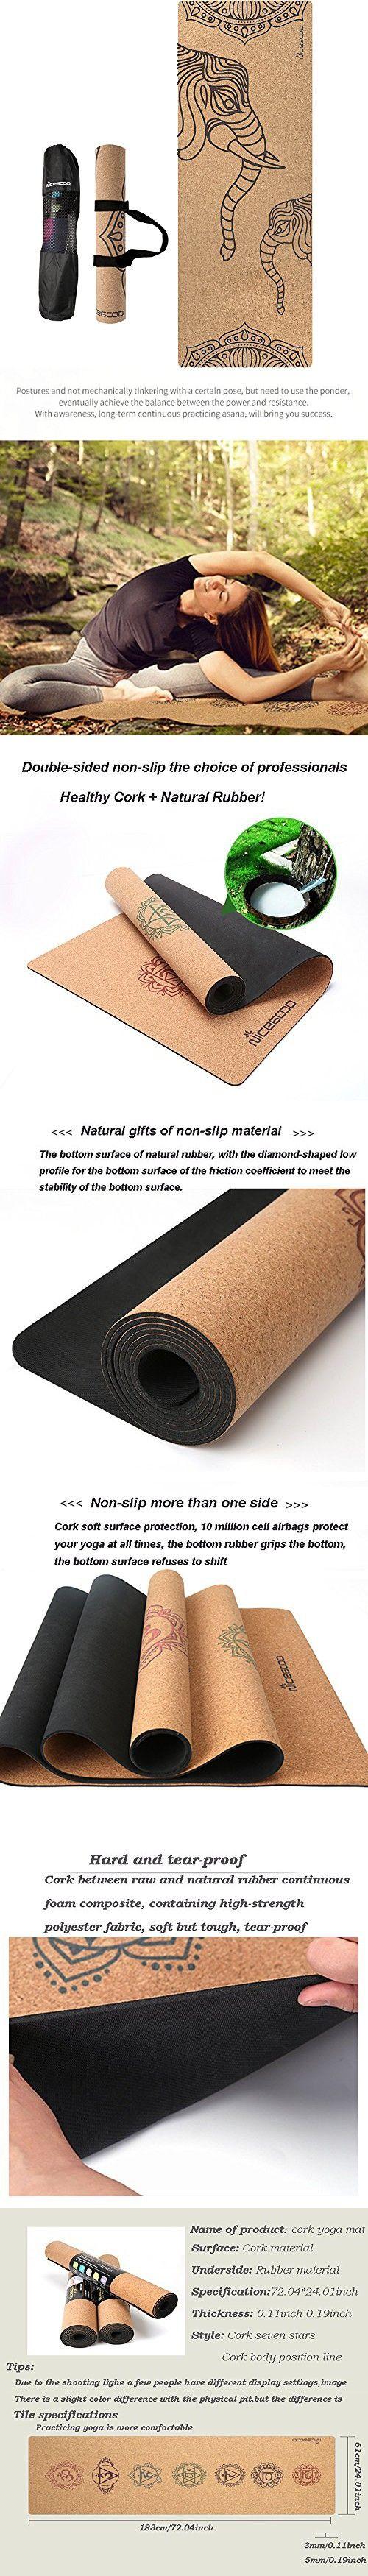 Nanle Cork Yoga Mat High Density Eco Friendly Natural Cork Tpe Sports Yoga Mat Natural Non Toxic Anti Slip Anti Bacterial Suitable For Pilates Fitness And Cork Yoga Mat Yoga Mat Pilates